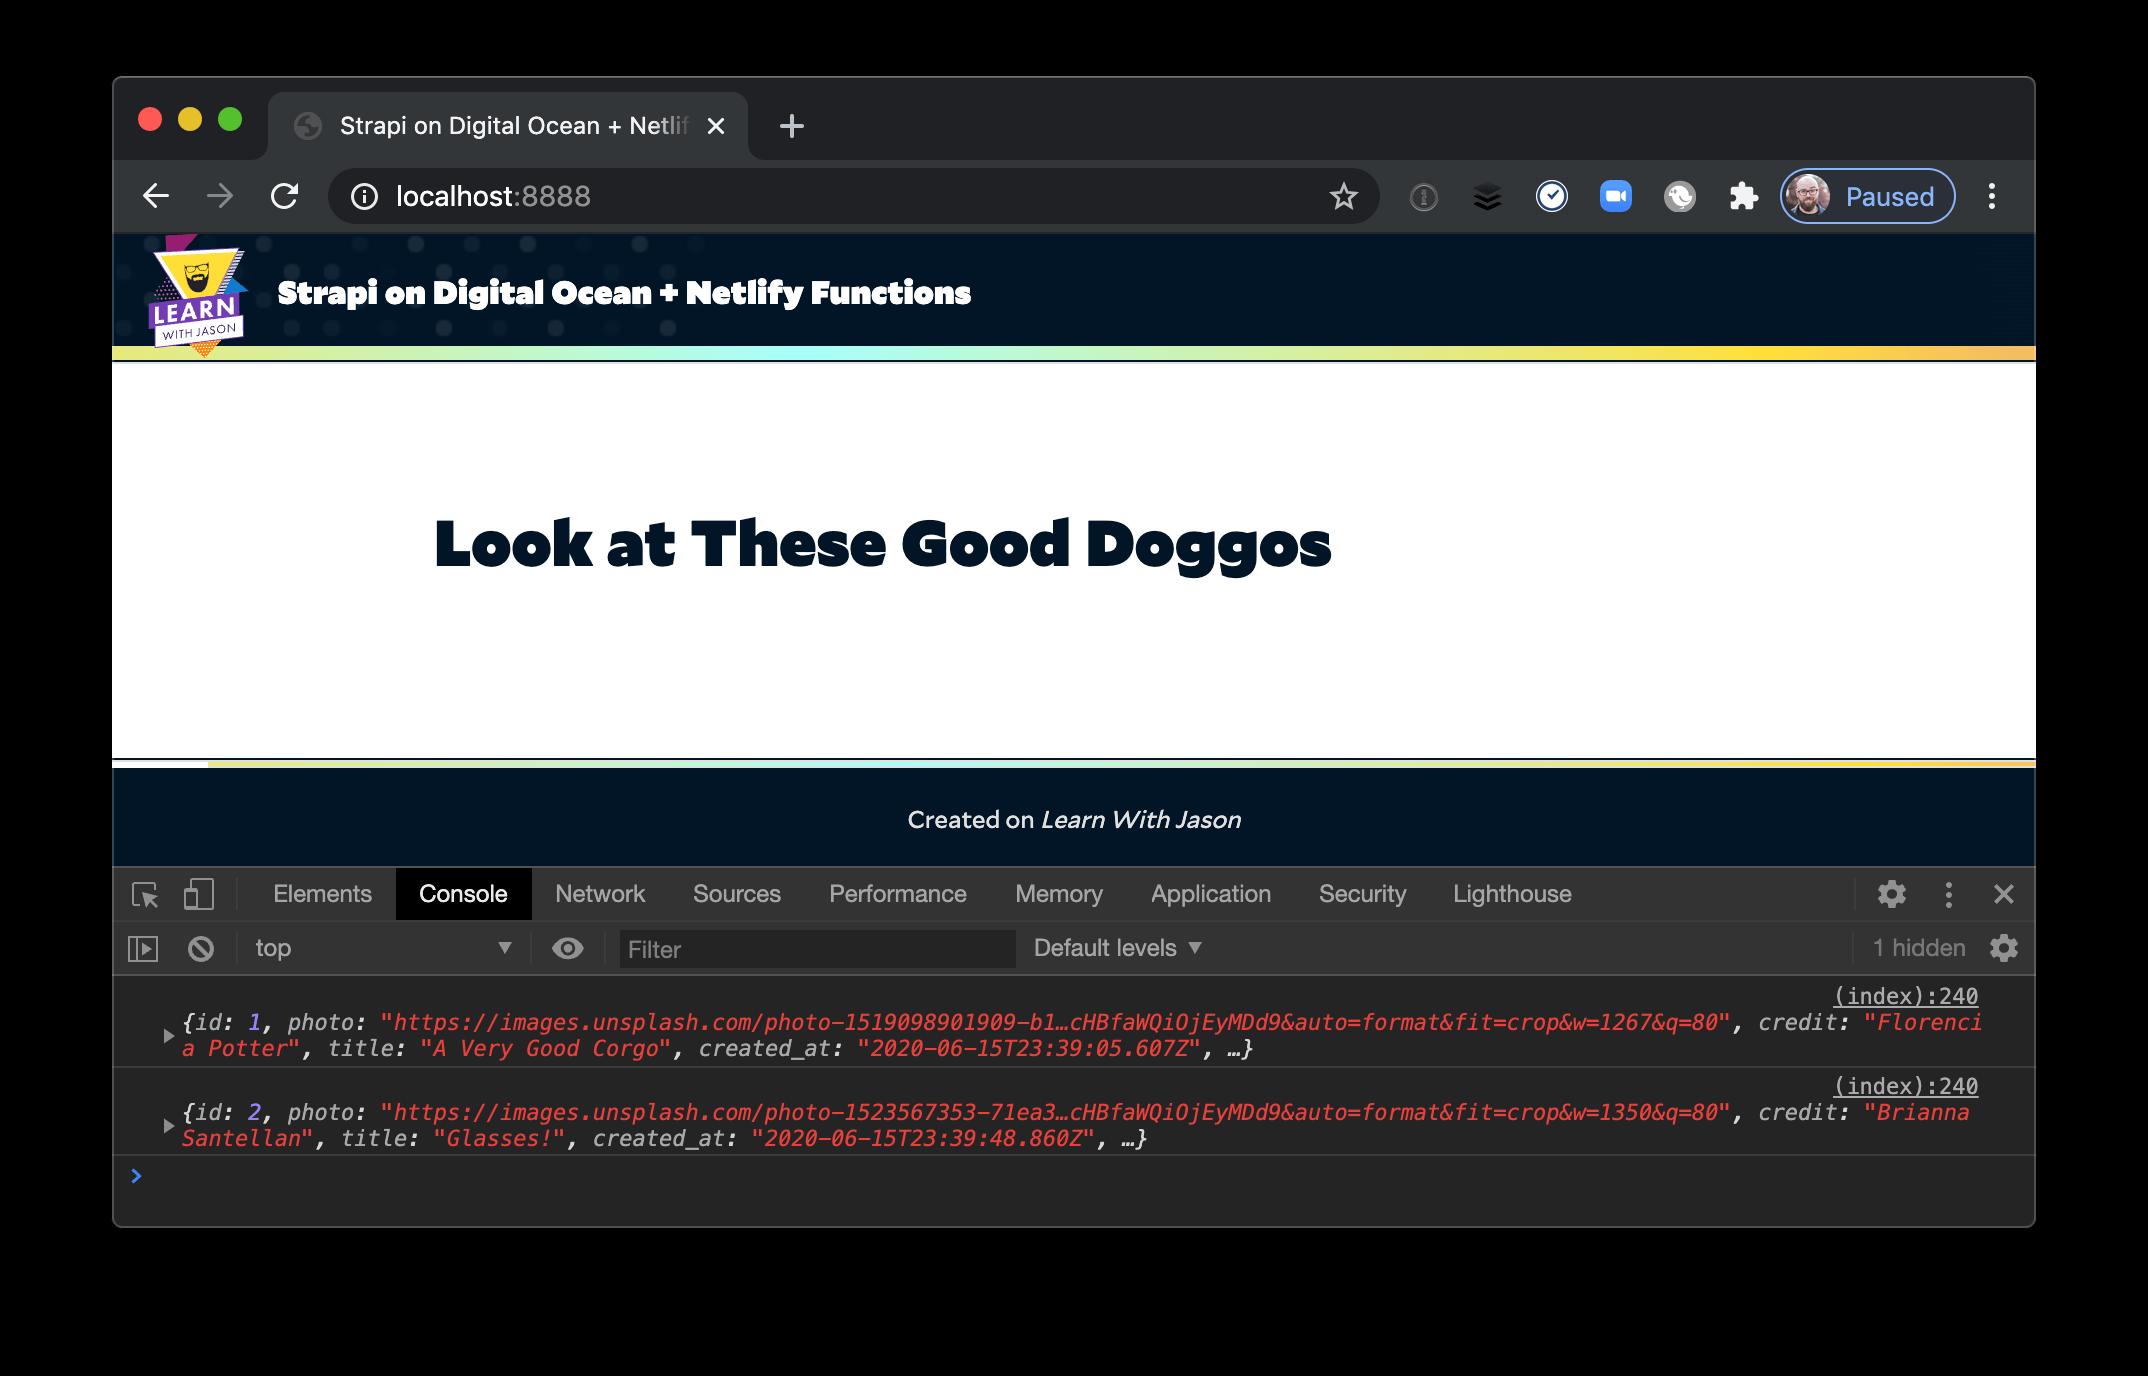 Corgi data logged in the console.